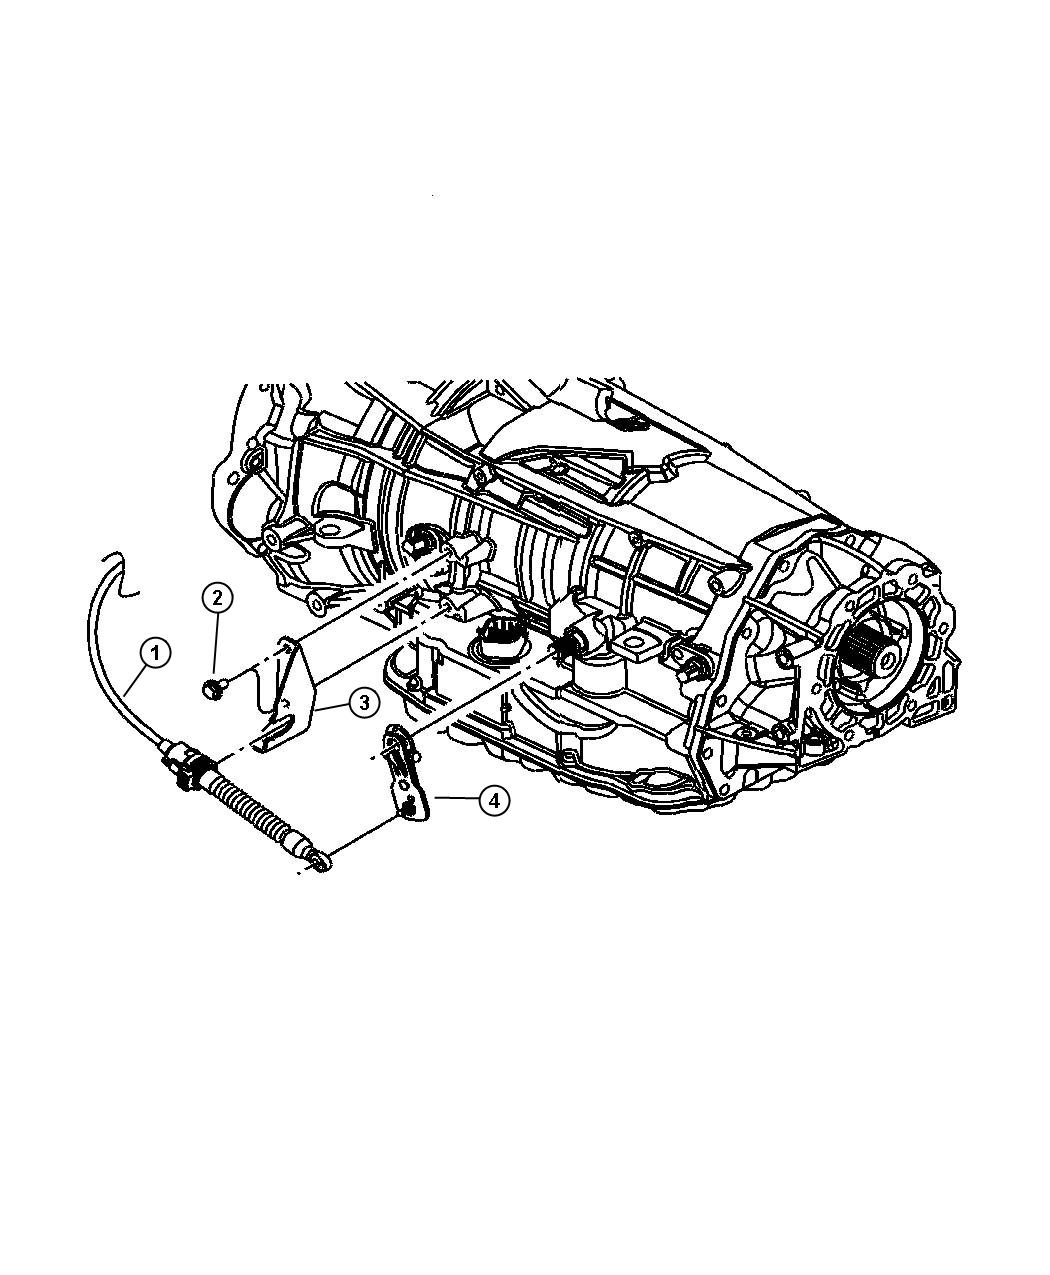 Dodge Durango Lever Manual Control With Floor Mount